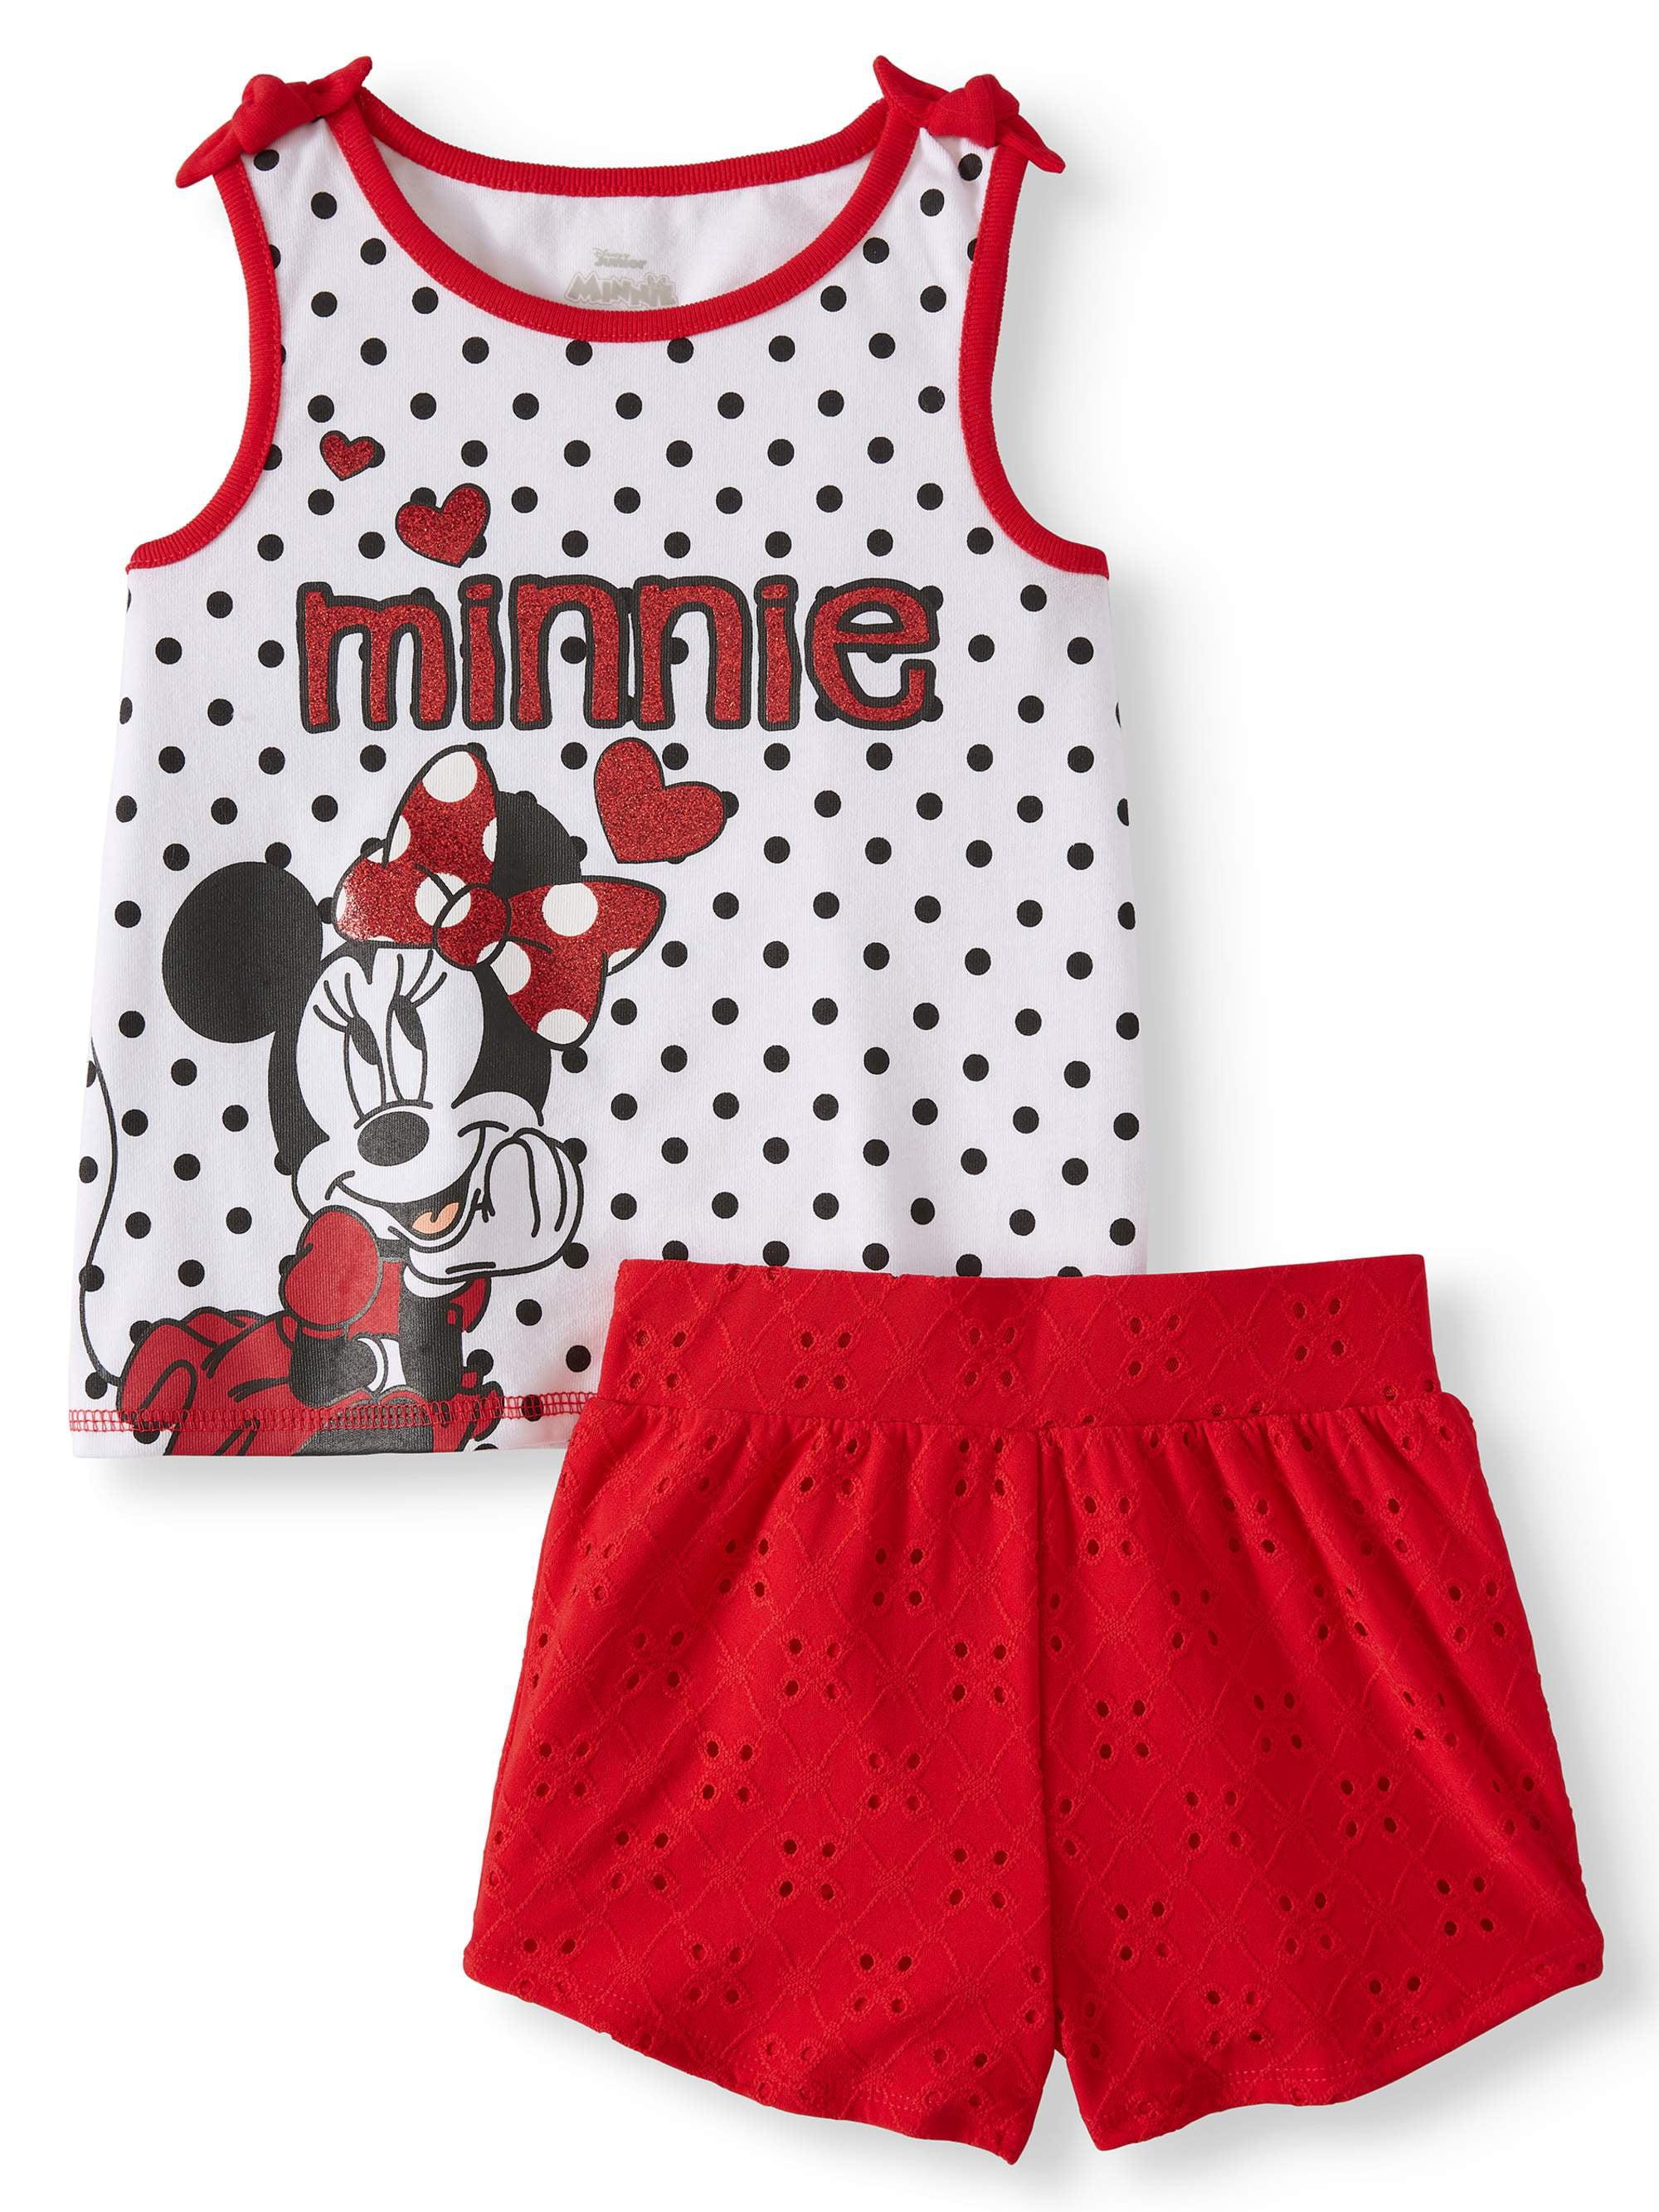 Minnie Mouse Delightful in Denim Fashion Doll Clothing Set